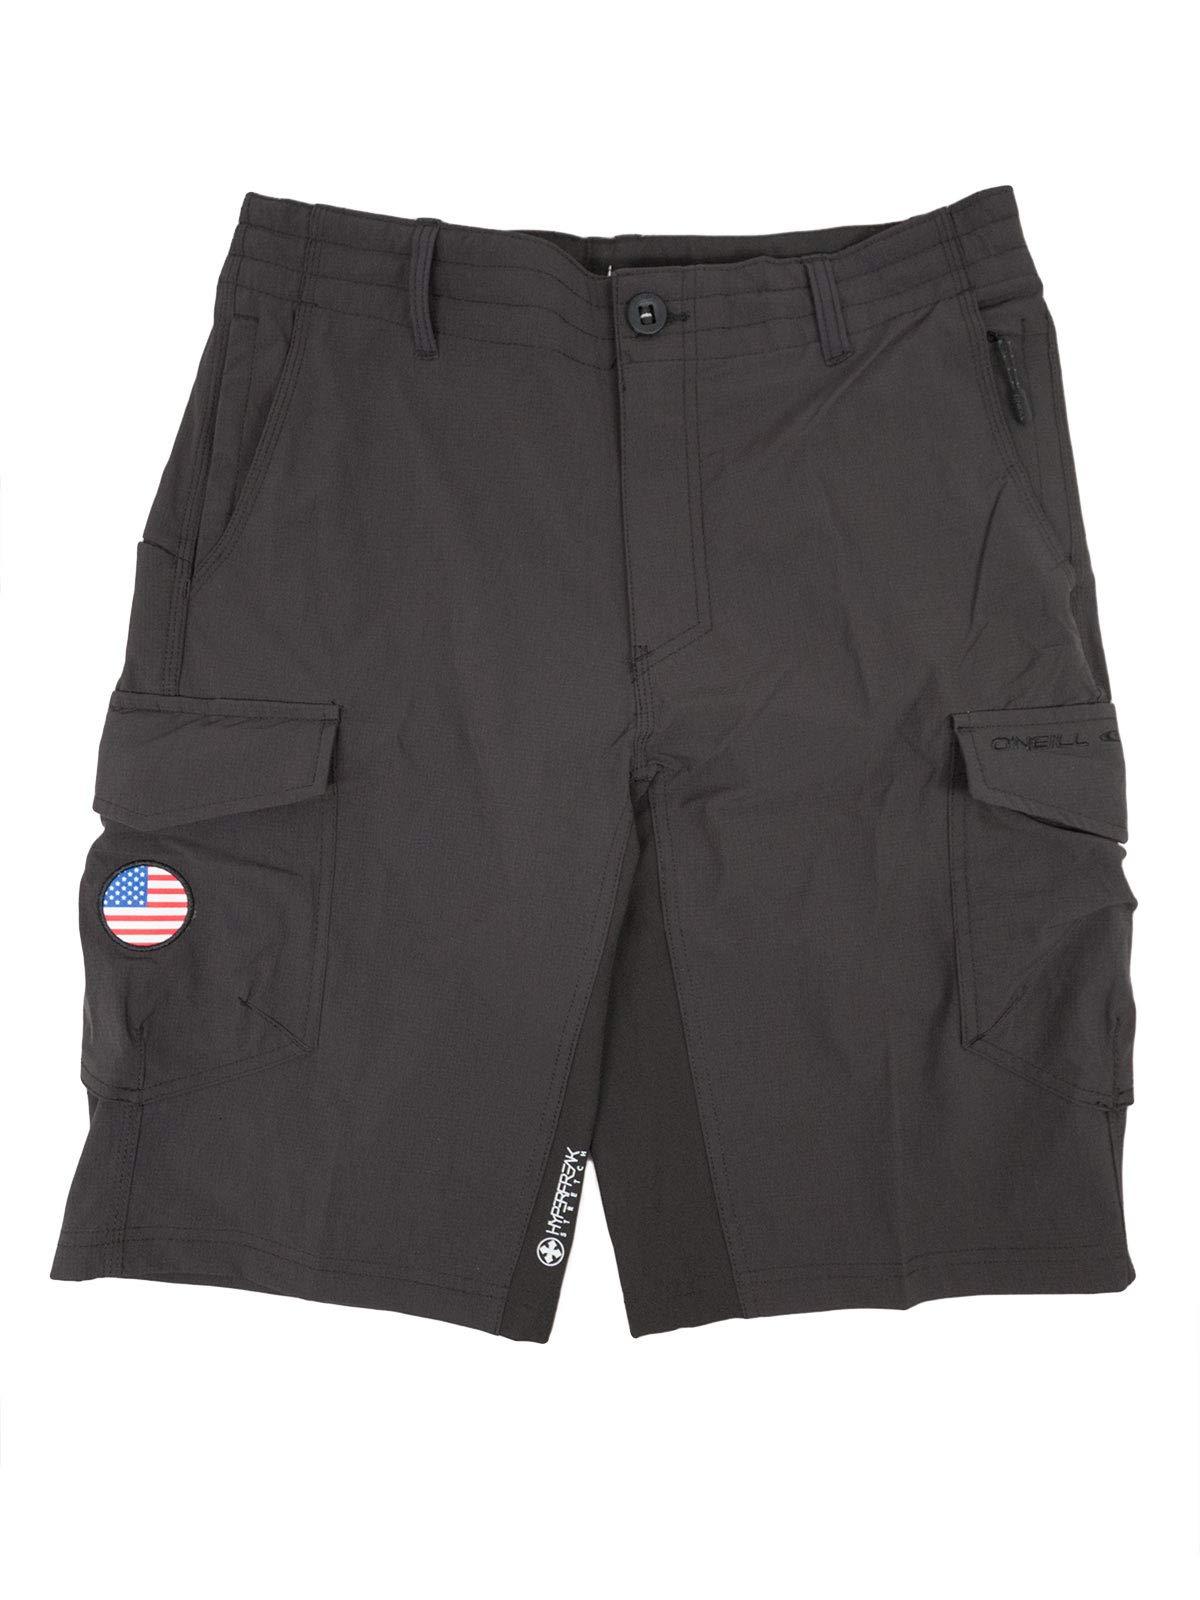 O'NEILL Men's GI Jack Traveler Cargo Pocket Hybrid Stretch Walk Short, 21 Inch Outseam [Extended Sizing – Up to Size 48]